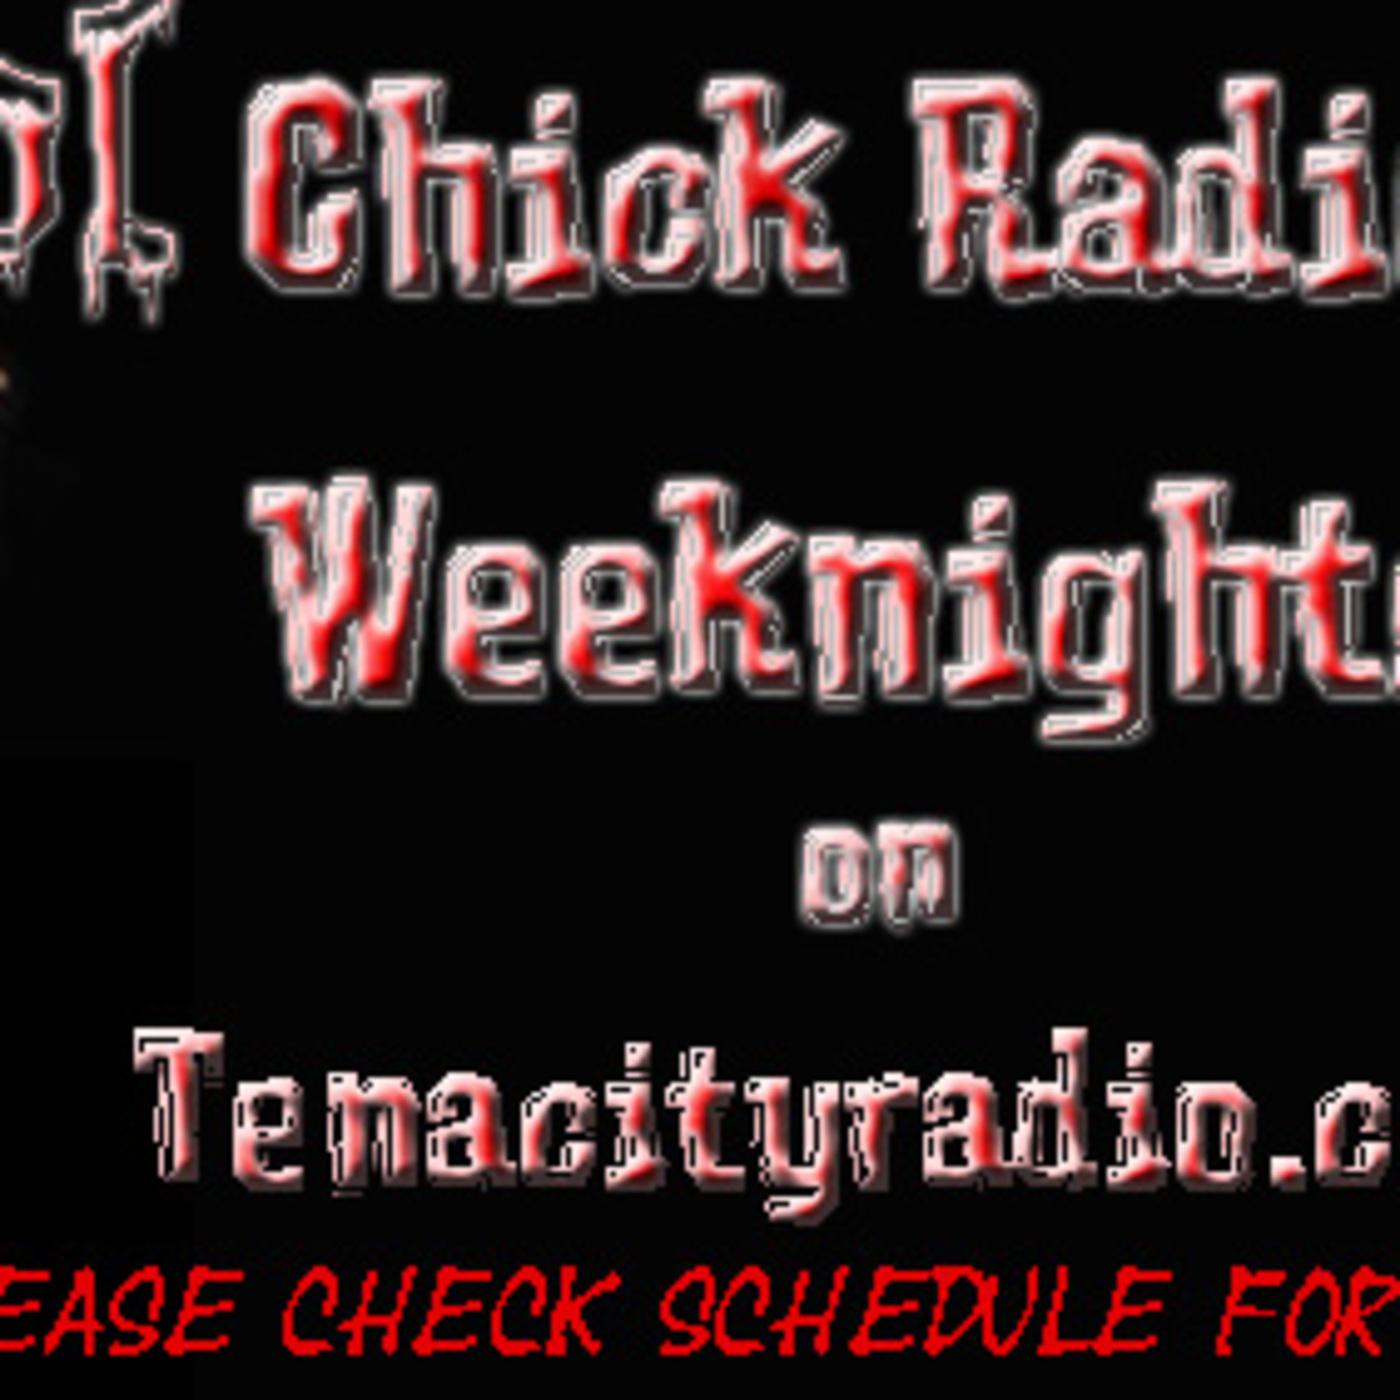 Cool Chick Radio